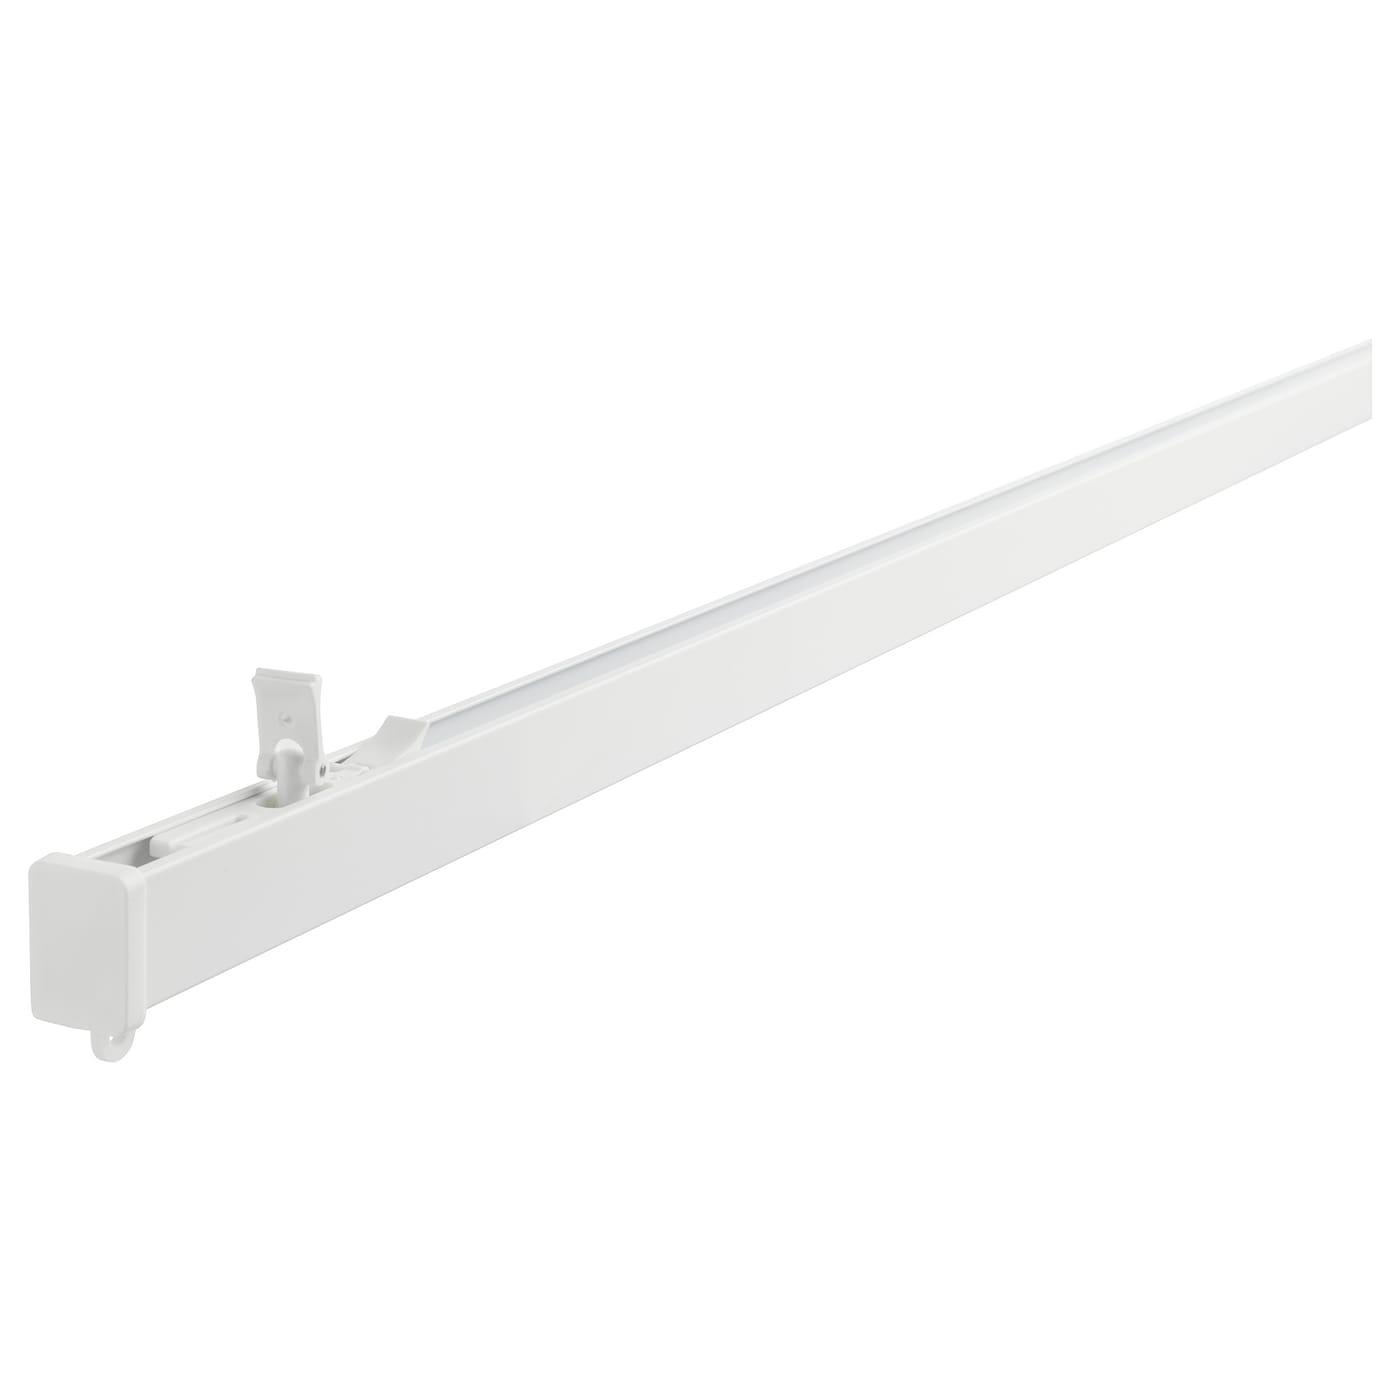 Vidga Riel De Cortina De 1 Raíl Blanco 140 Cm Ikea